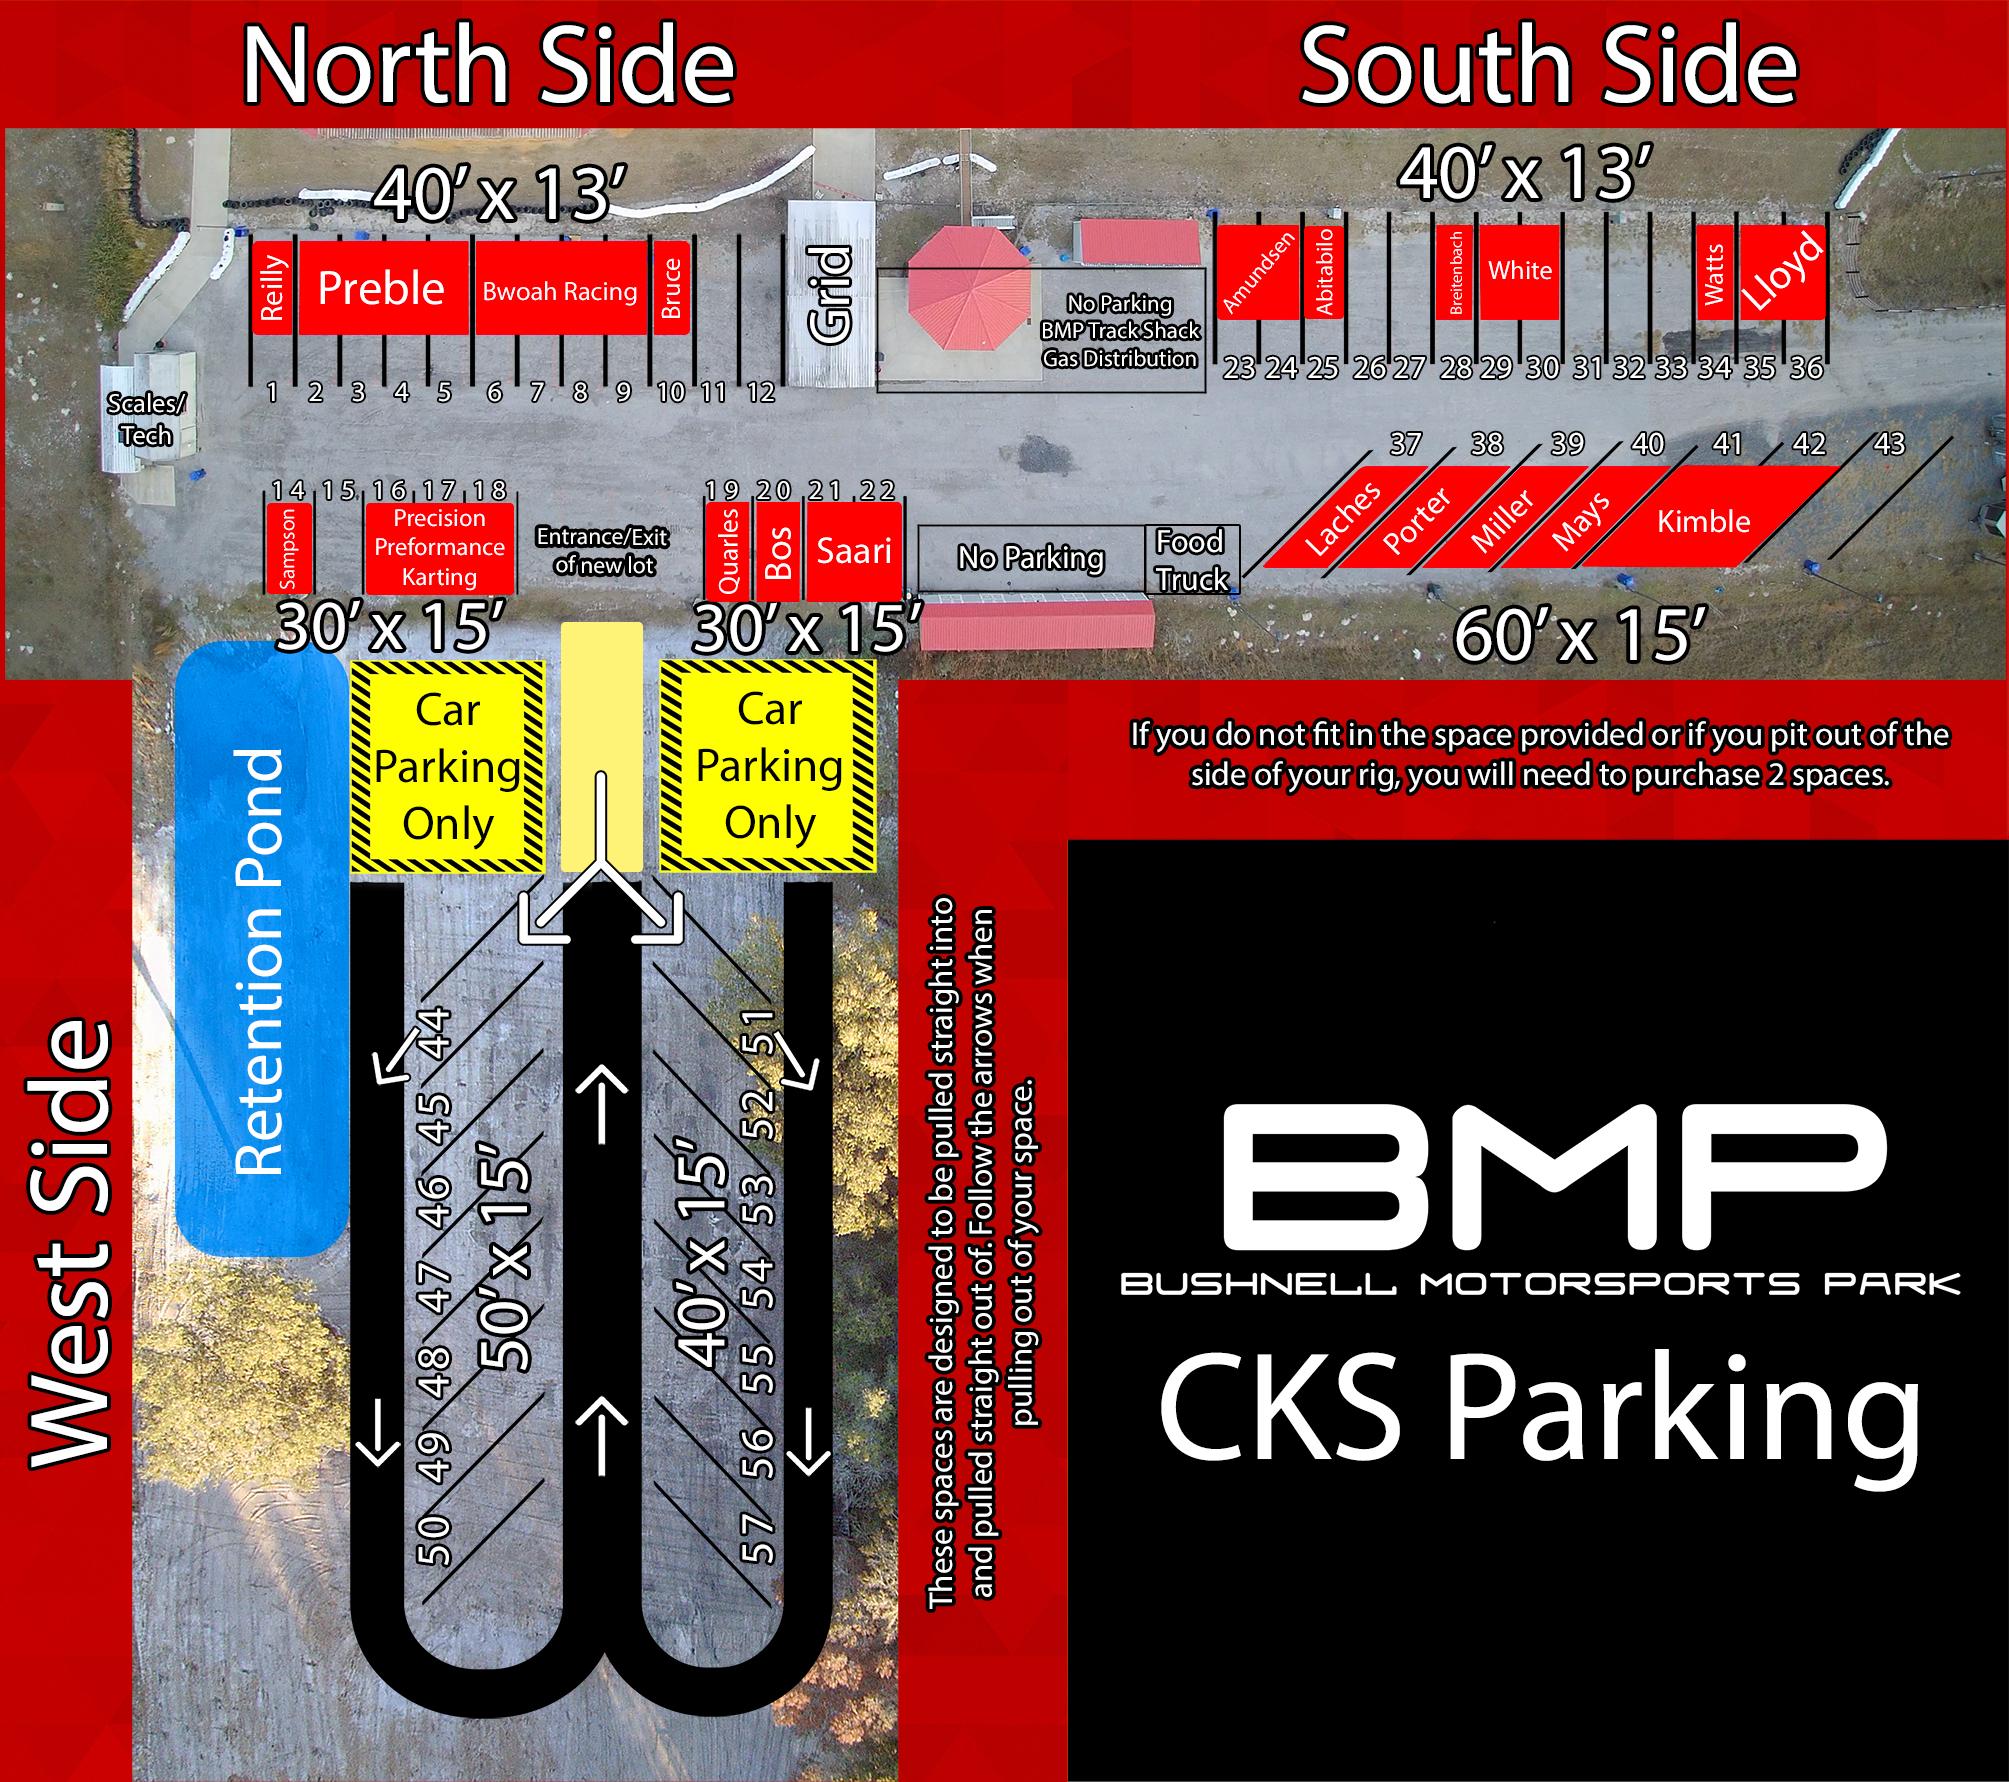 CKS BMP Parking